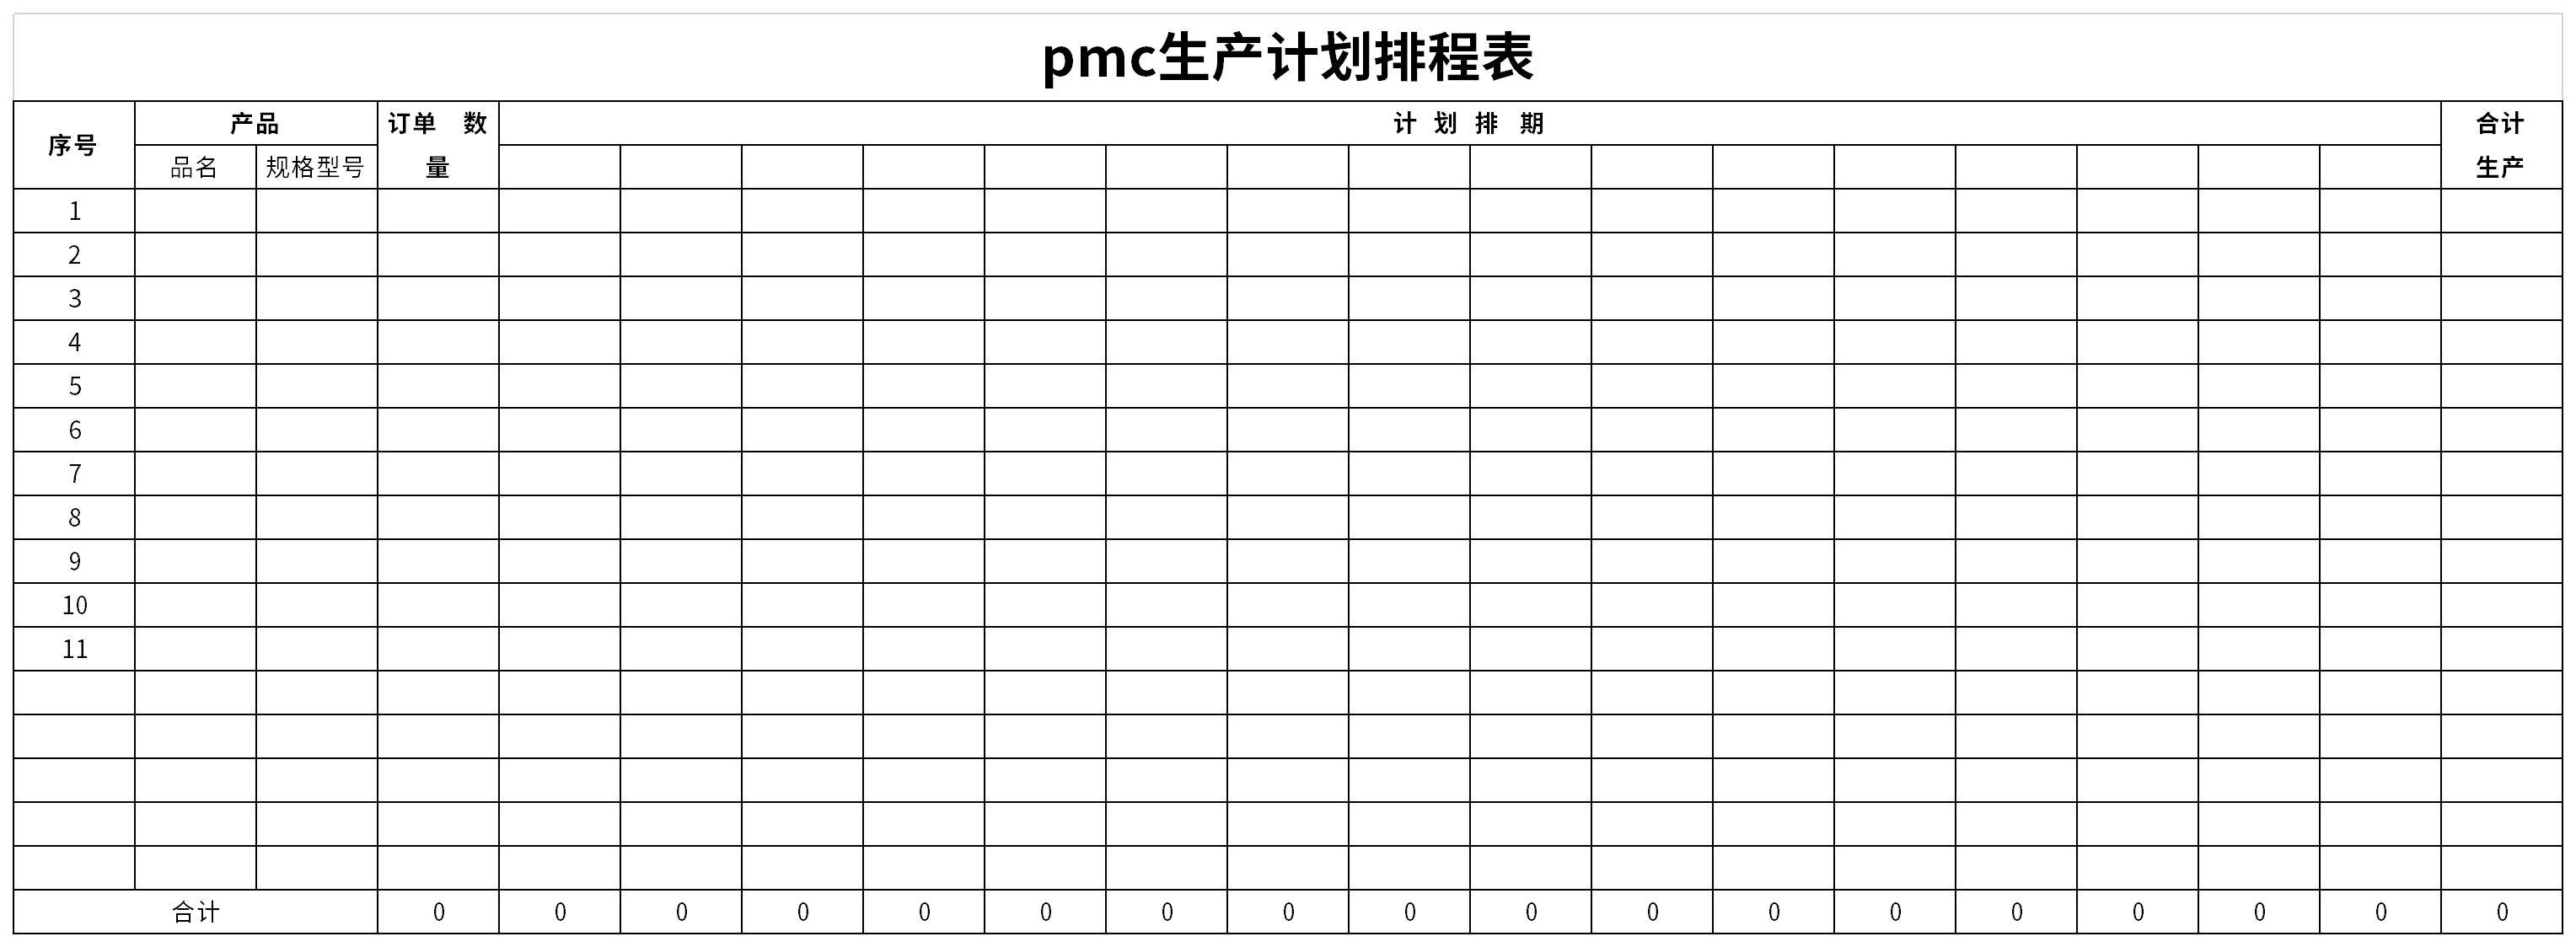 pmc生产计划排程表截图